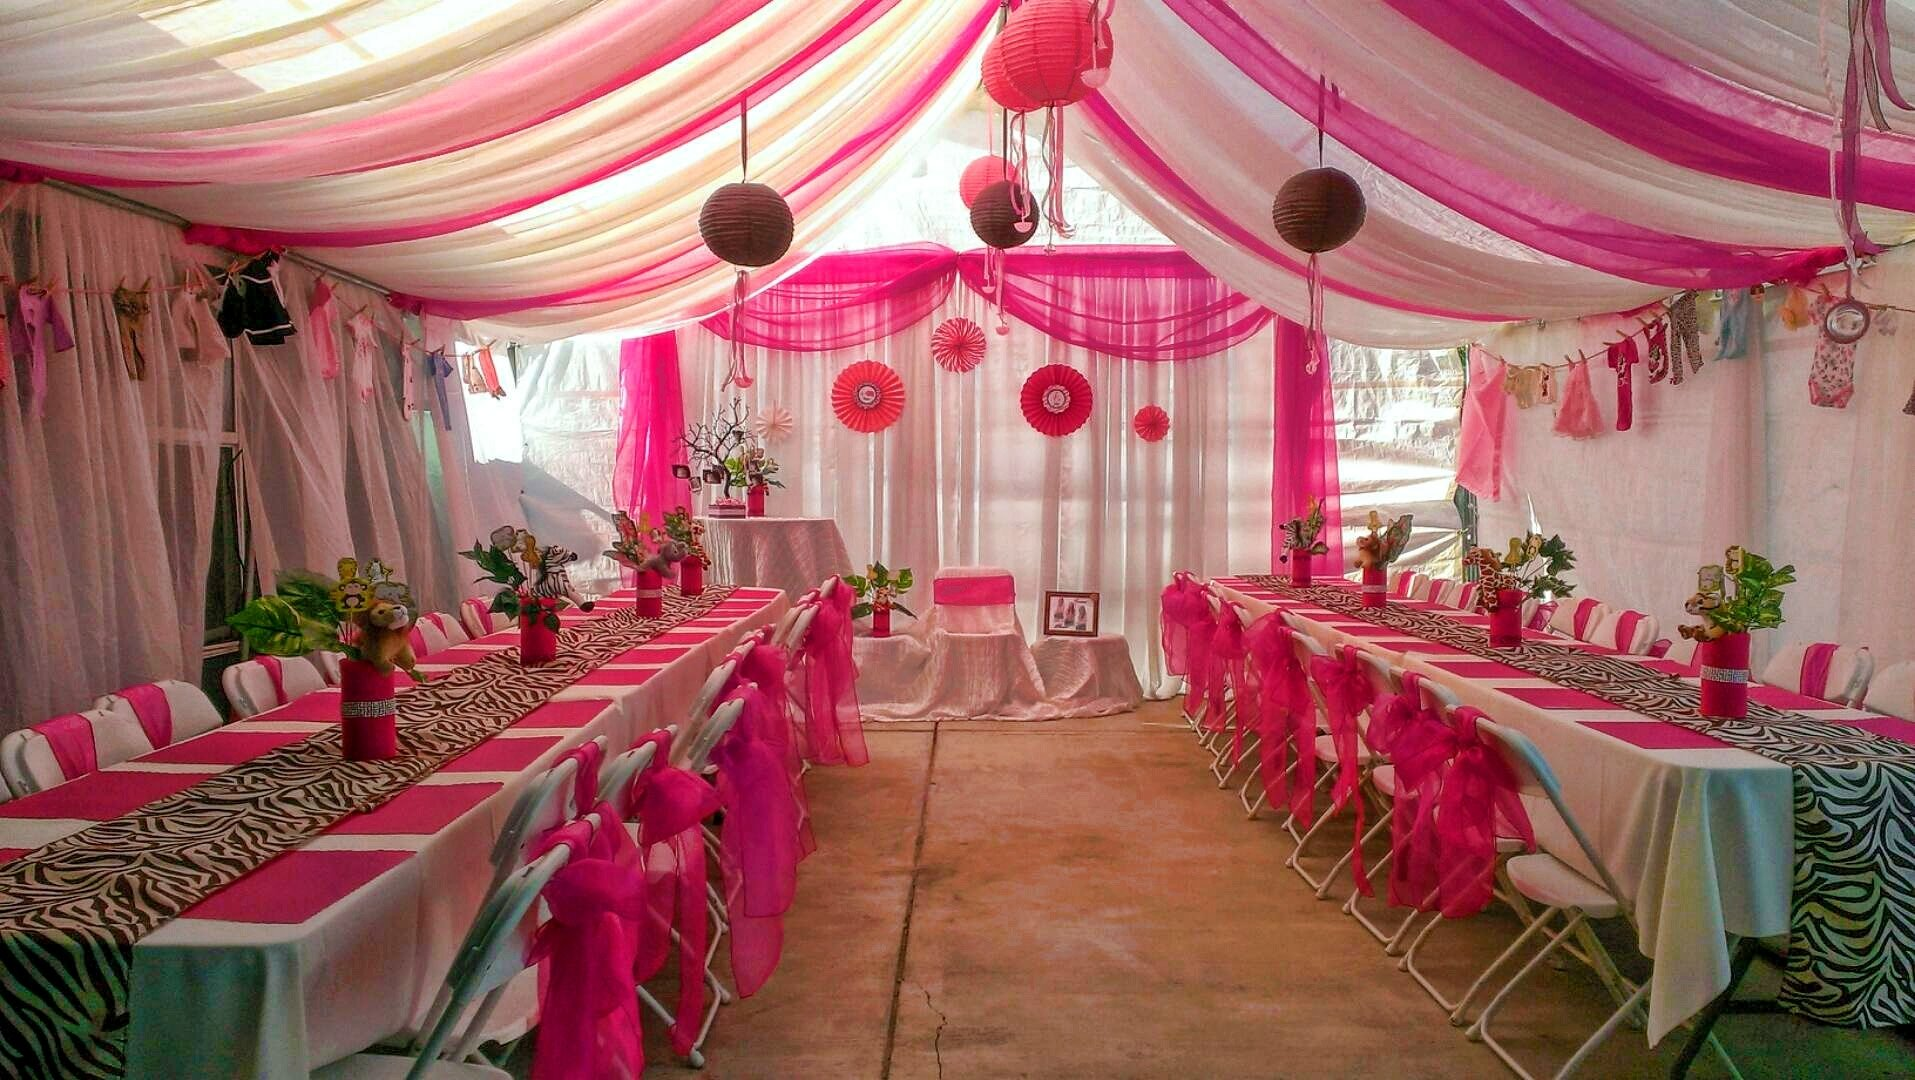 10 Fashionable Cute Baby Shower Decoration Ideas baby shower decorations ideas exquisite girl jpg loversiq 3 2020